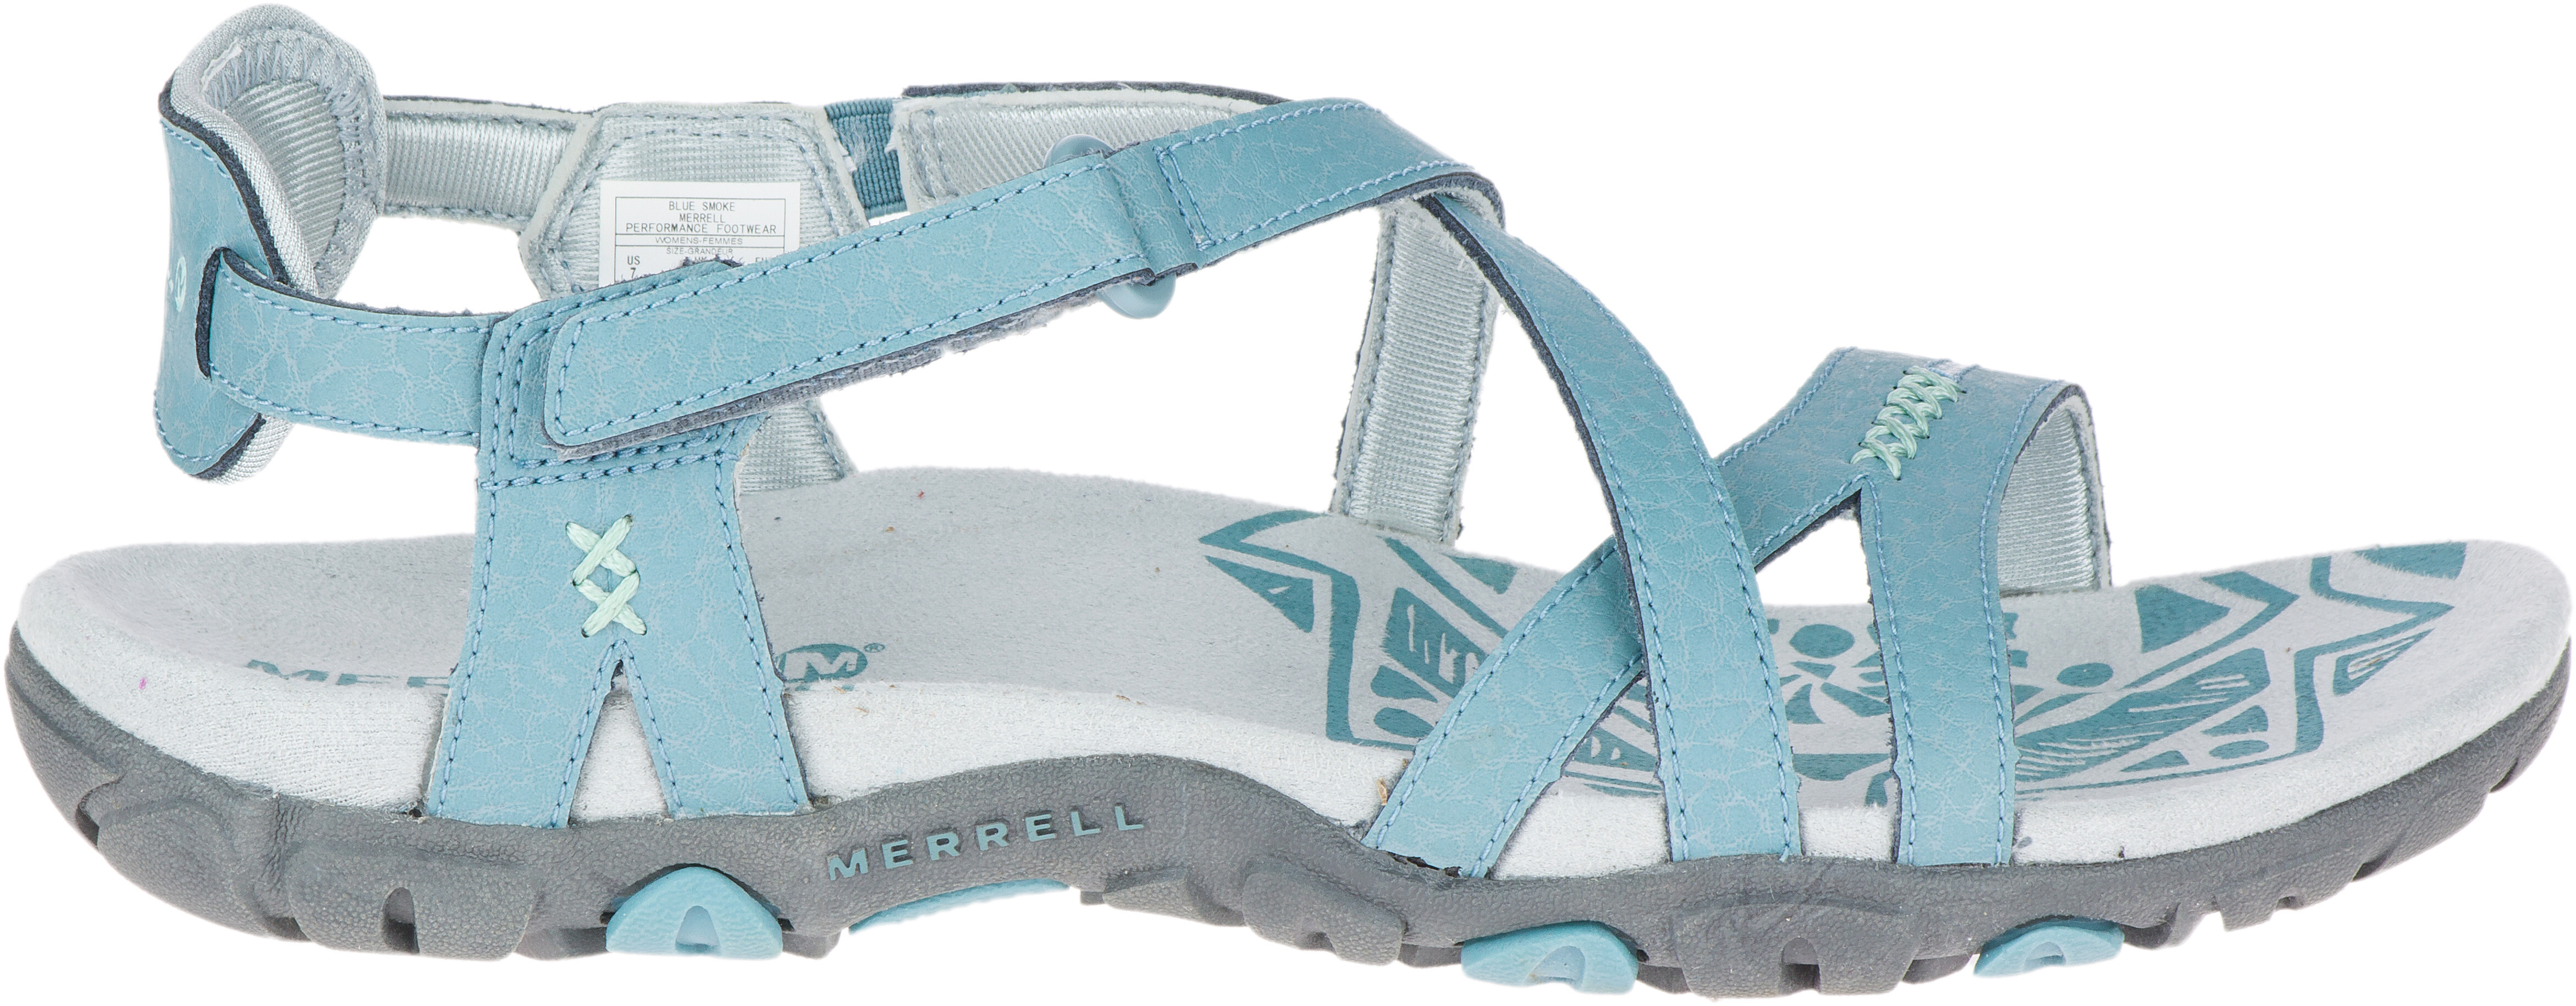 d0d864b78567 Merrell Sandspur Rose LTR Sandals Women grey turquoise at Addnature ...